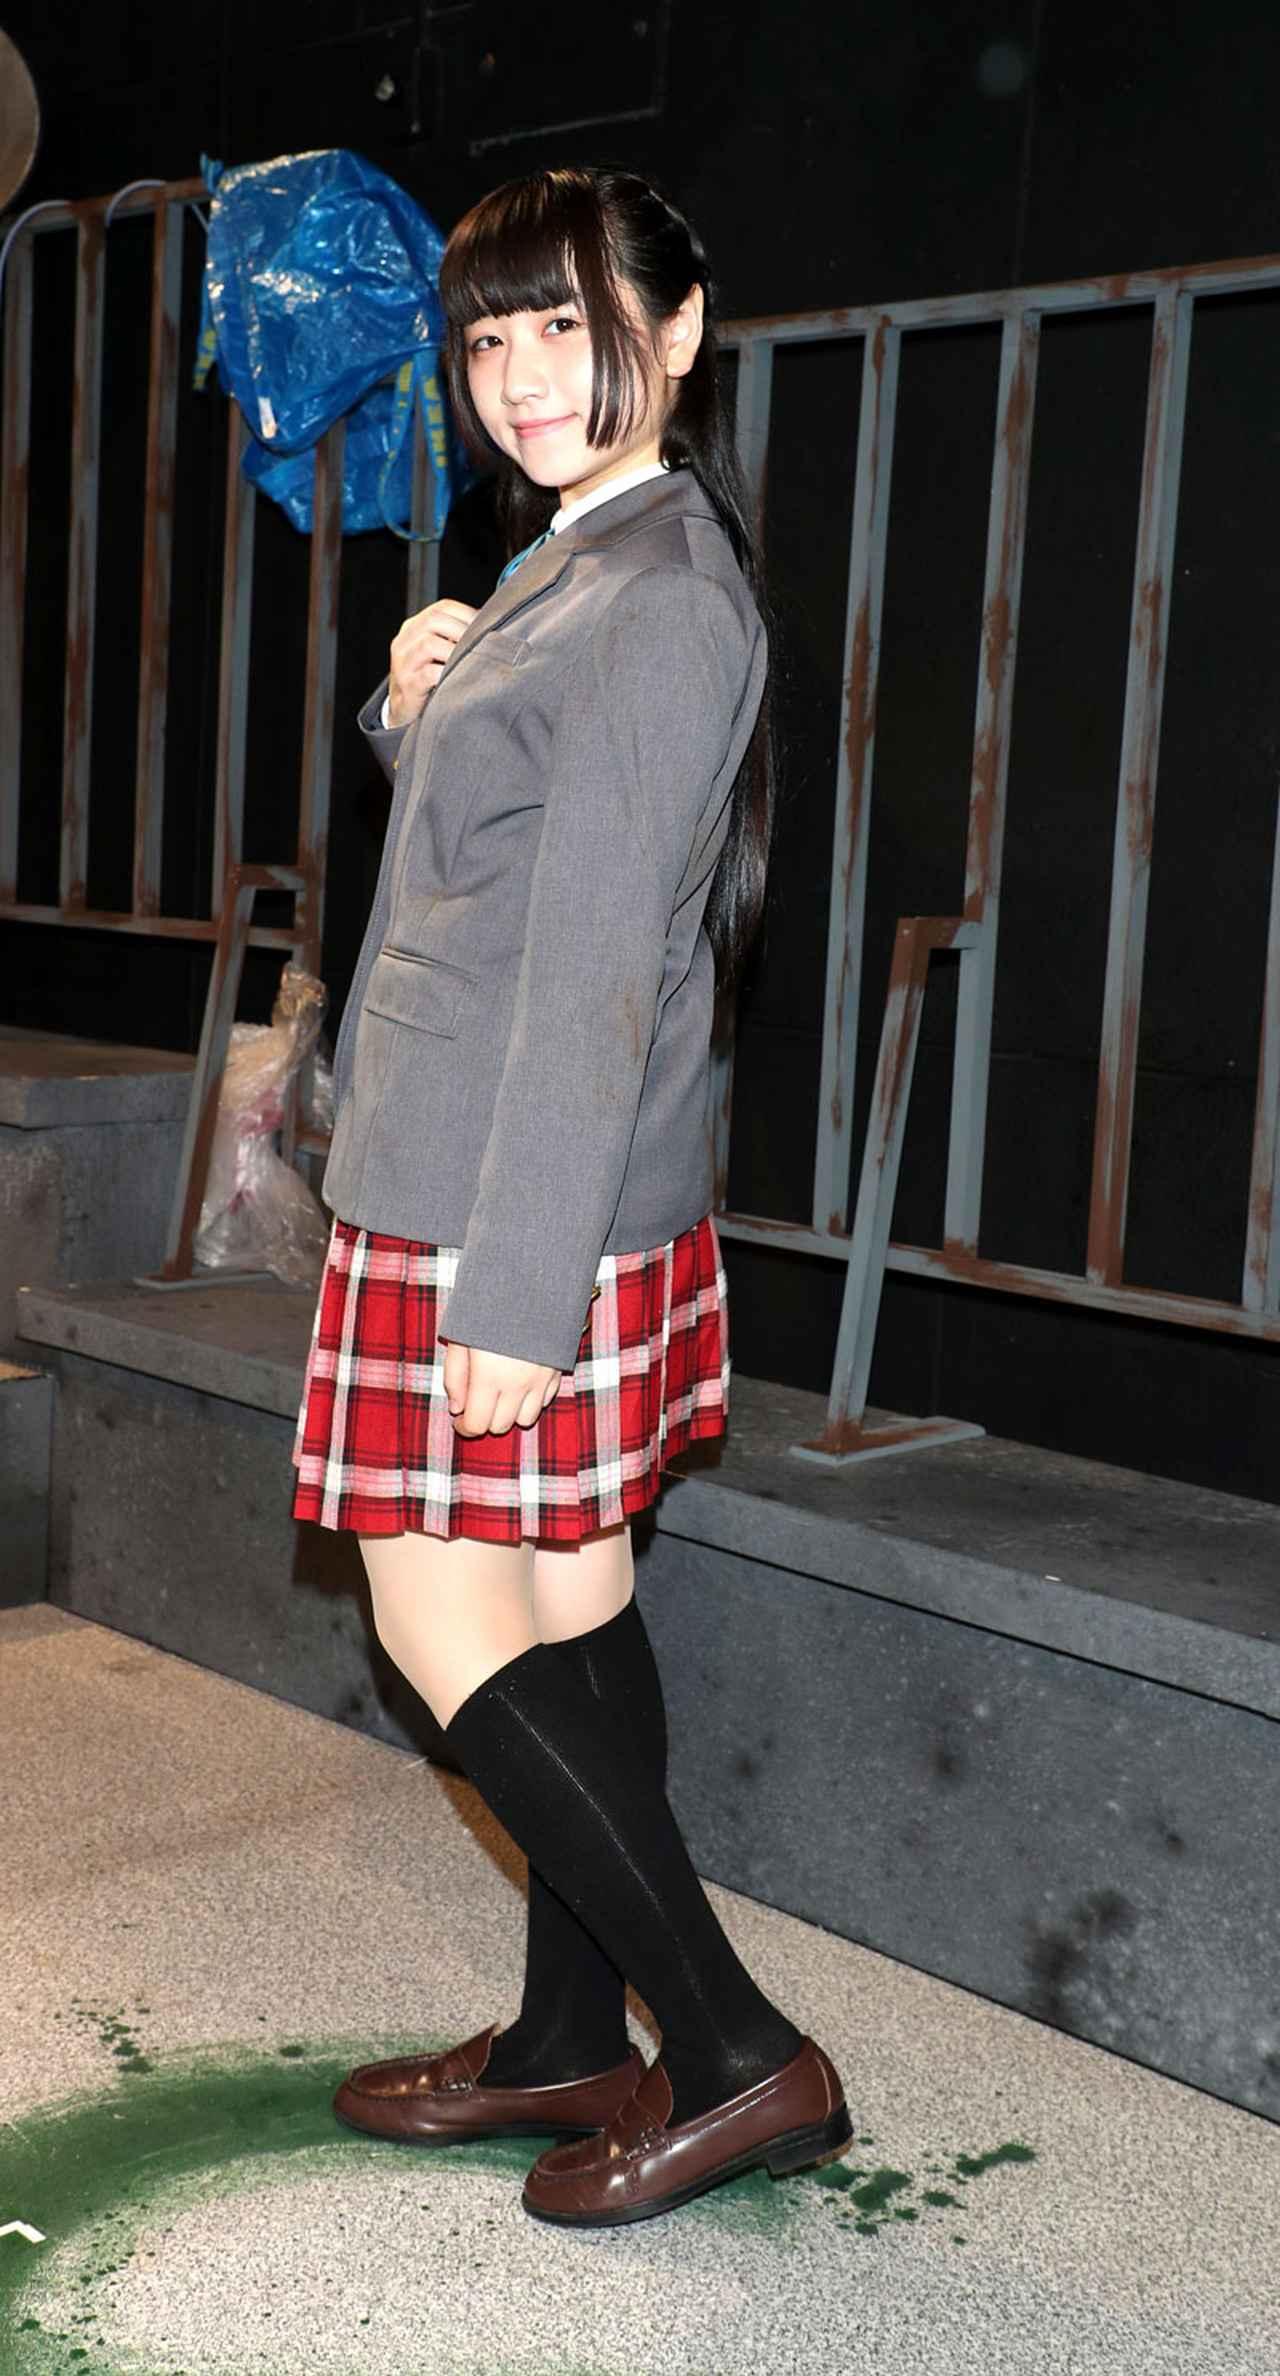 Images : 6番目の画像 - 「花岡芽佳、秋吉あき/アリスインプロジェクト最新作「最果ての星」で可憐な美少女を熱演!」のアルバム - Stereo Sound ONLINE